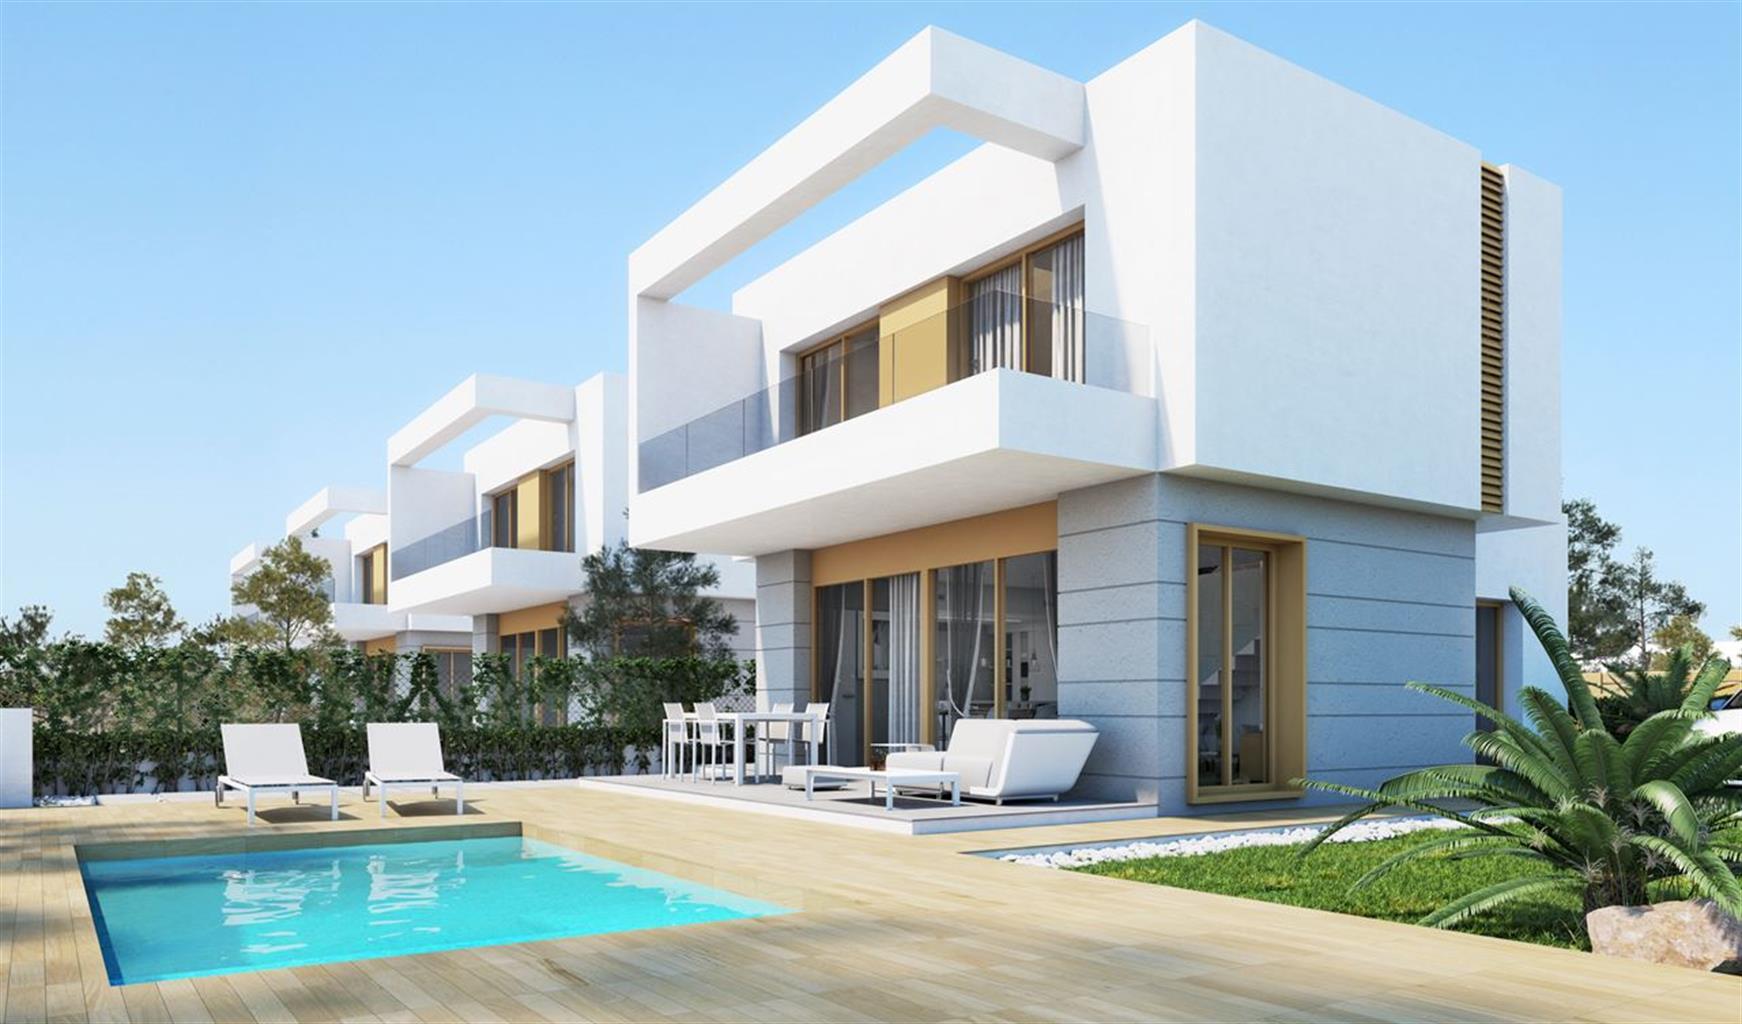 Grande villa contemporaine située au coeur du golf Vistabella.